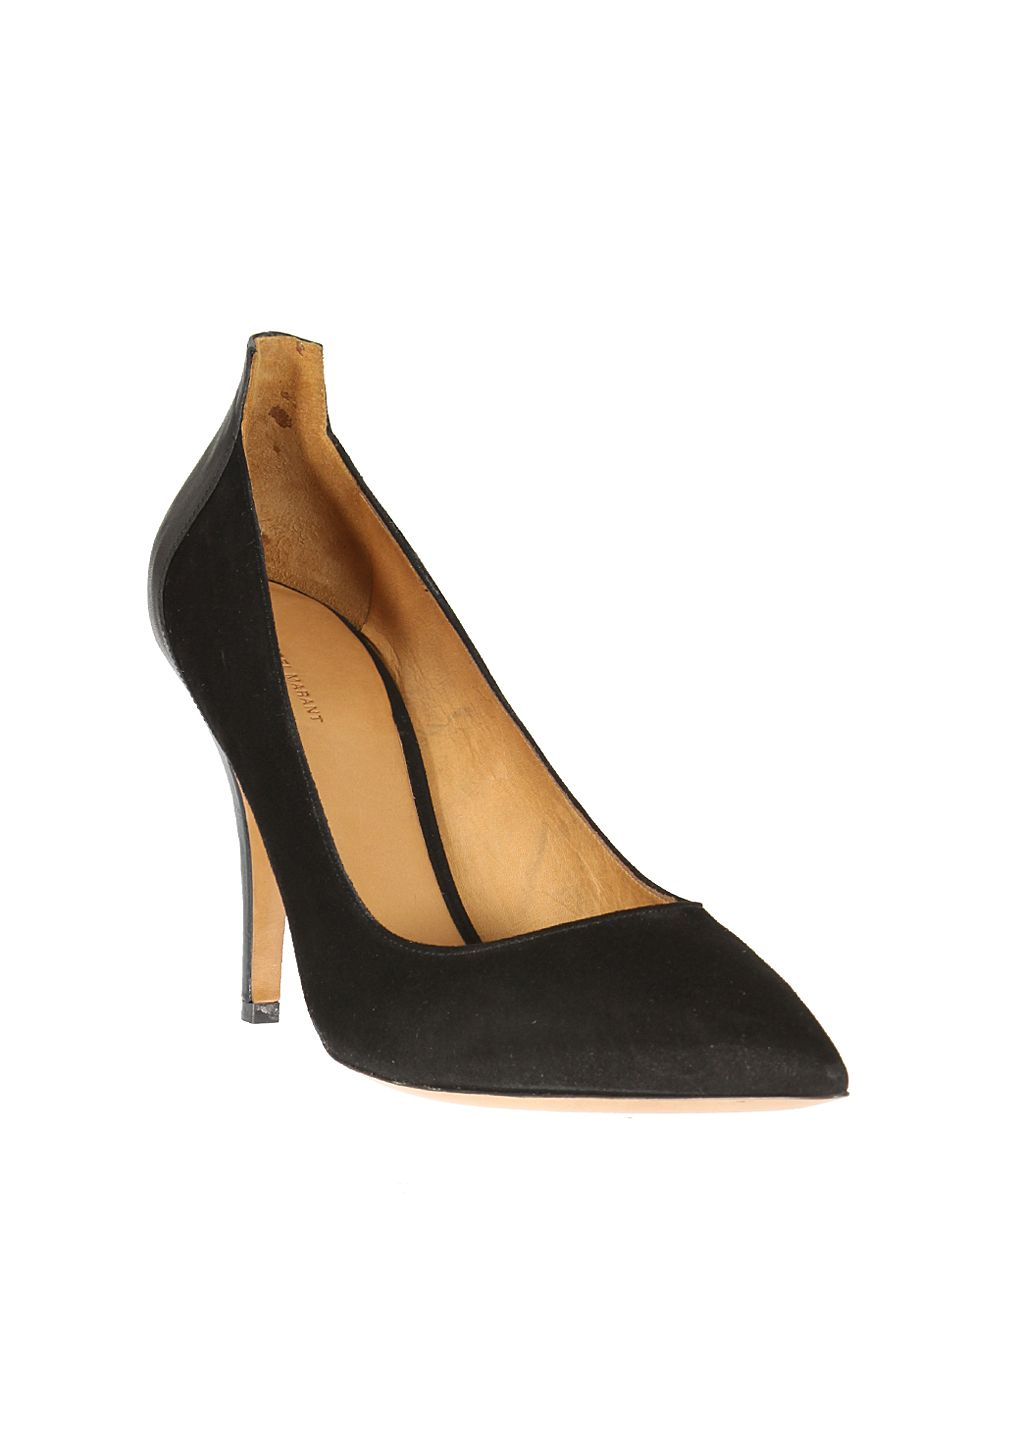 Isabel Marant Pumps :: Isabel Marant black suede and leather pumps | Montaigne Market